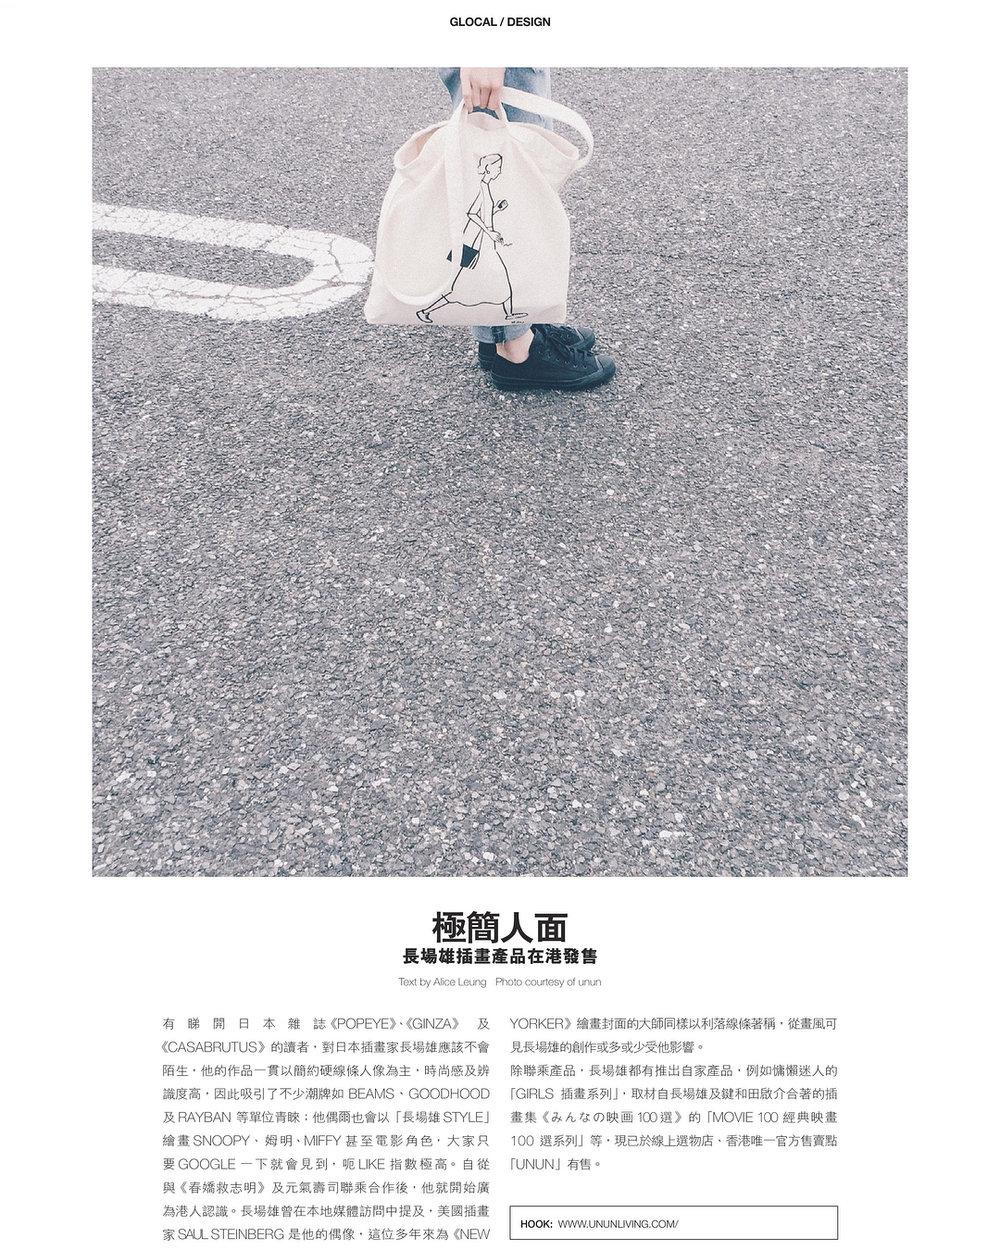 unun yu nagaba city magazine.jpg